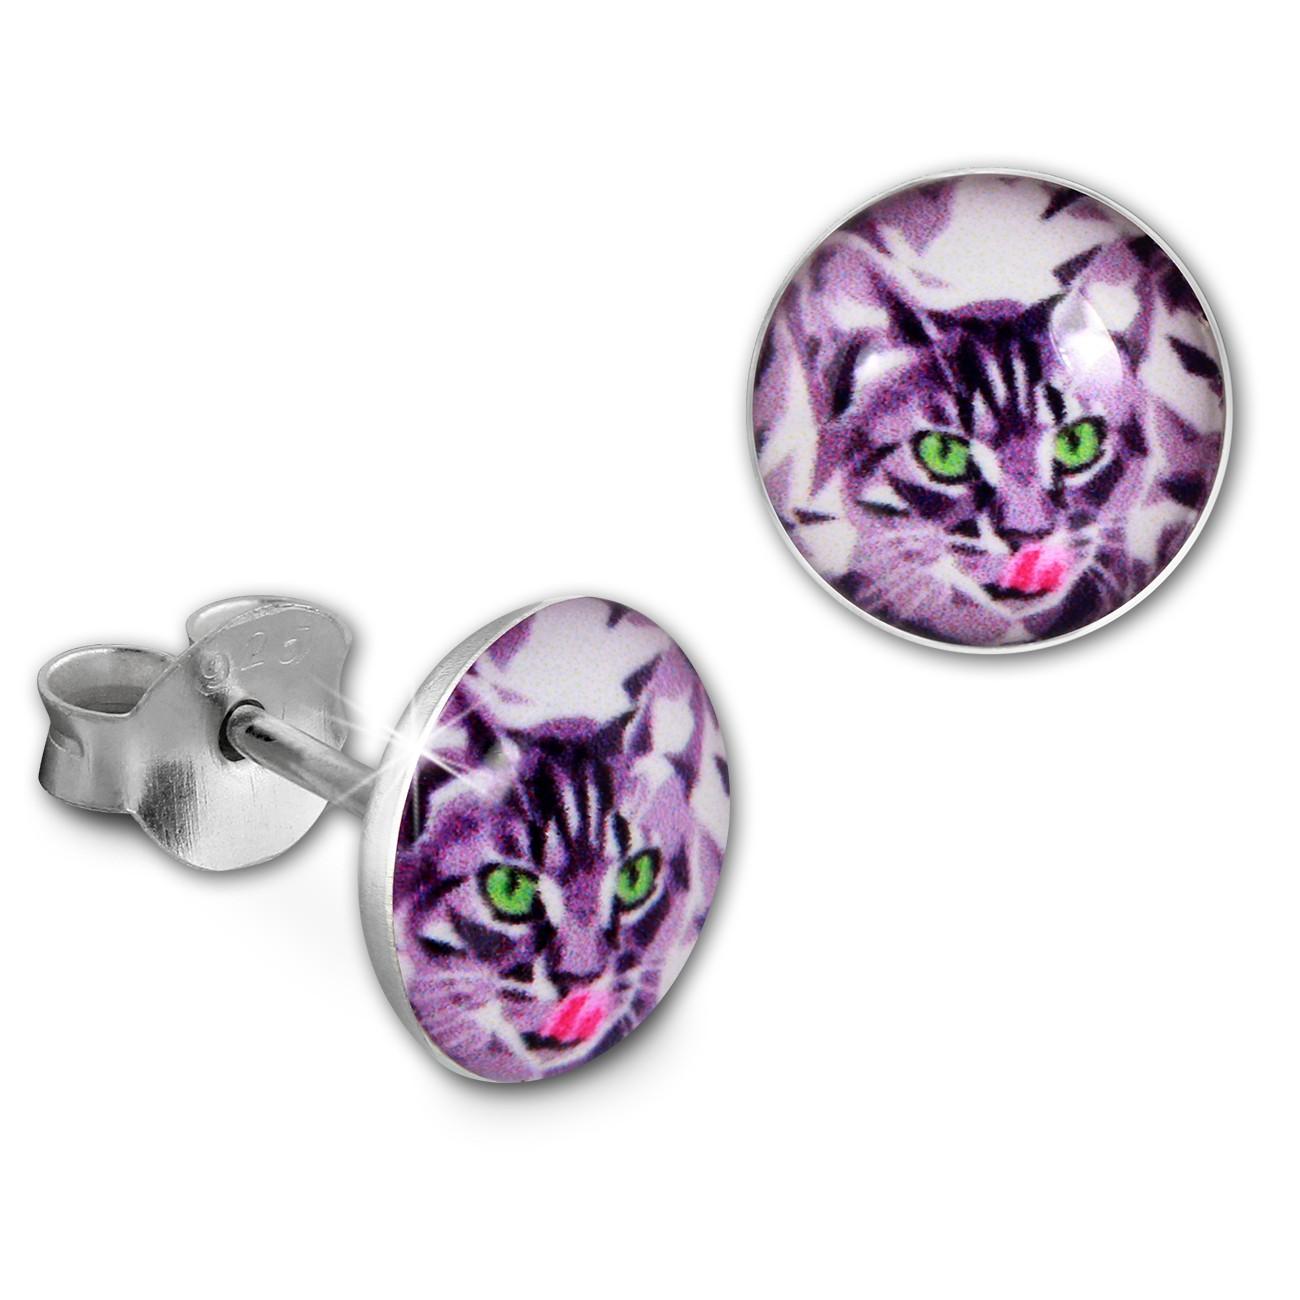 SilberDream Ohrstecker Logo Print Katze Kinder Damen Ohrring 925 Silber SDO85132